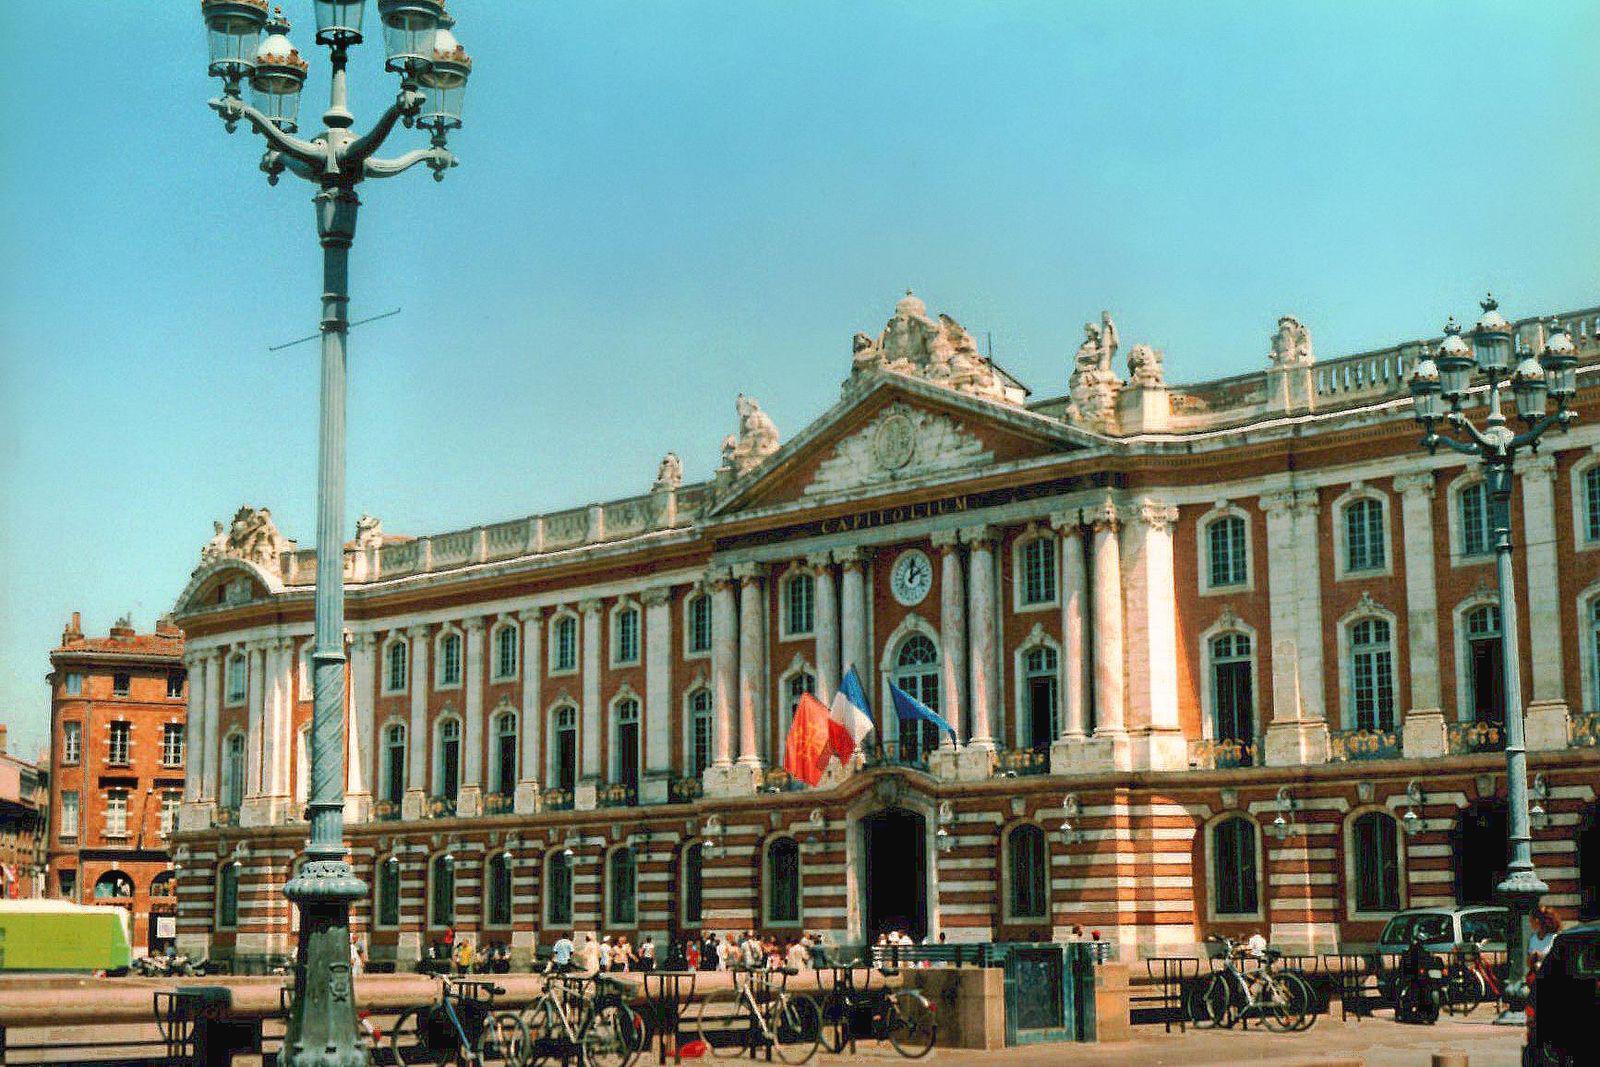 Image : Le Capitole